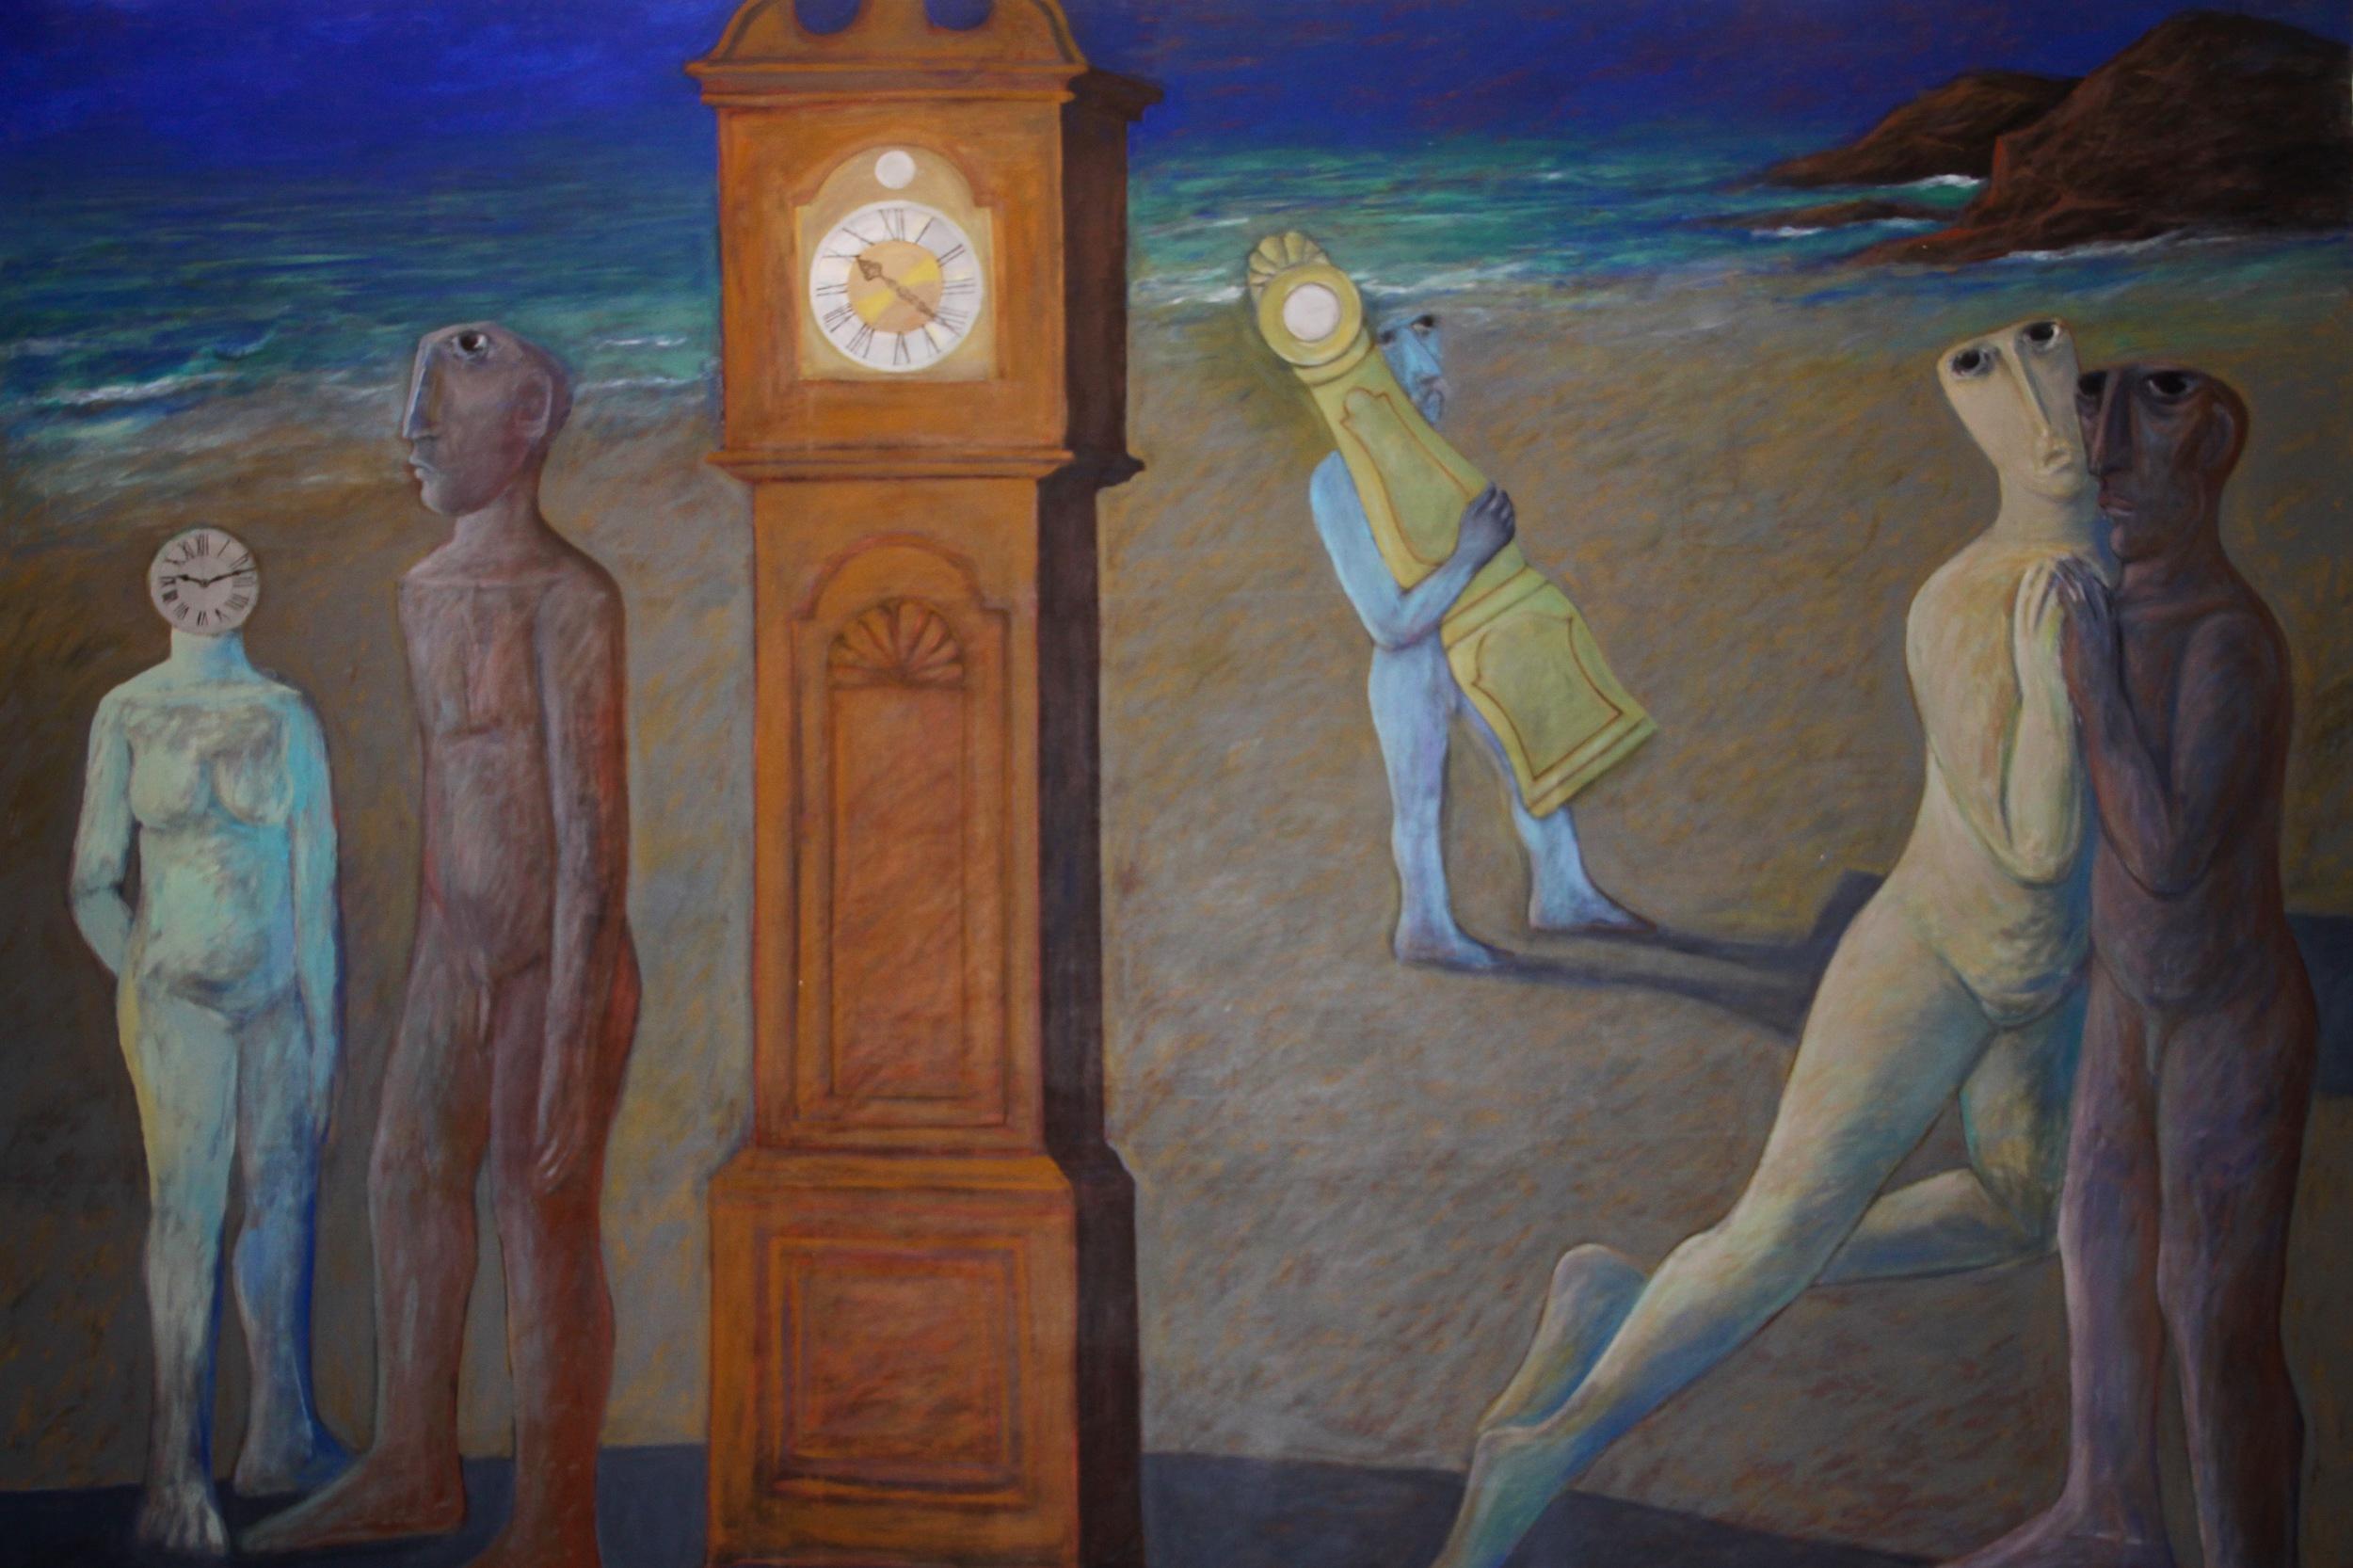 Ahmed Morsi,Clocks II,1998,Acrylic on canvas,305 x 209 cm.